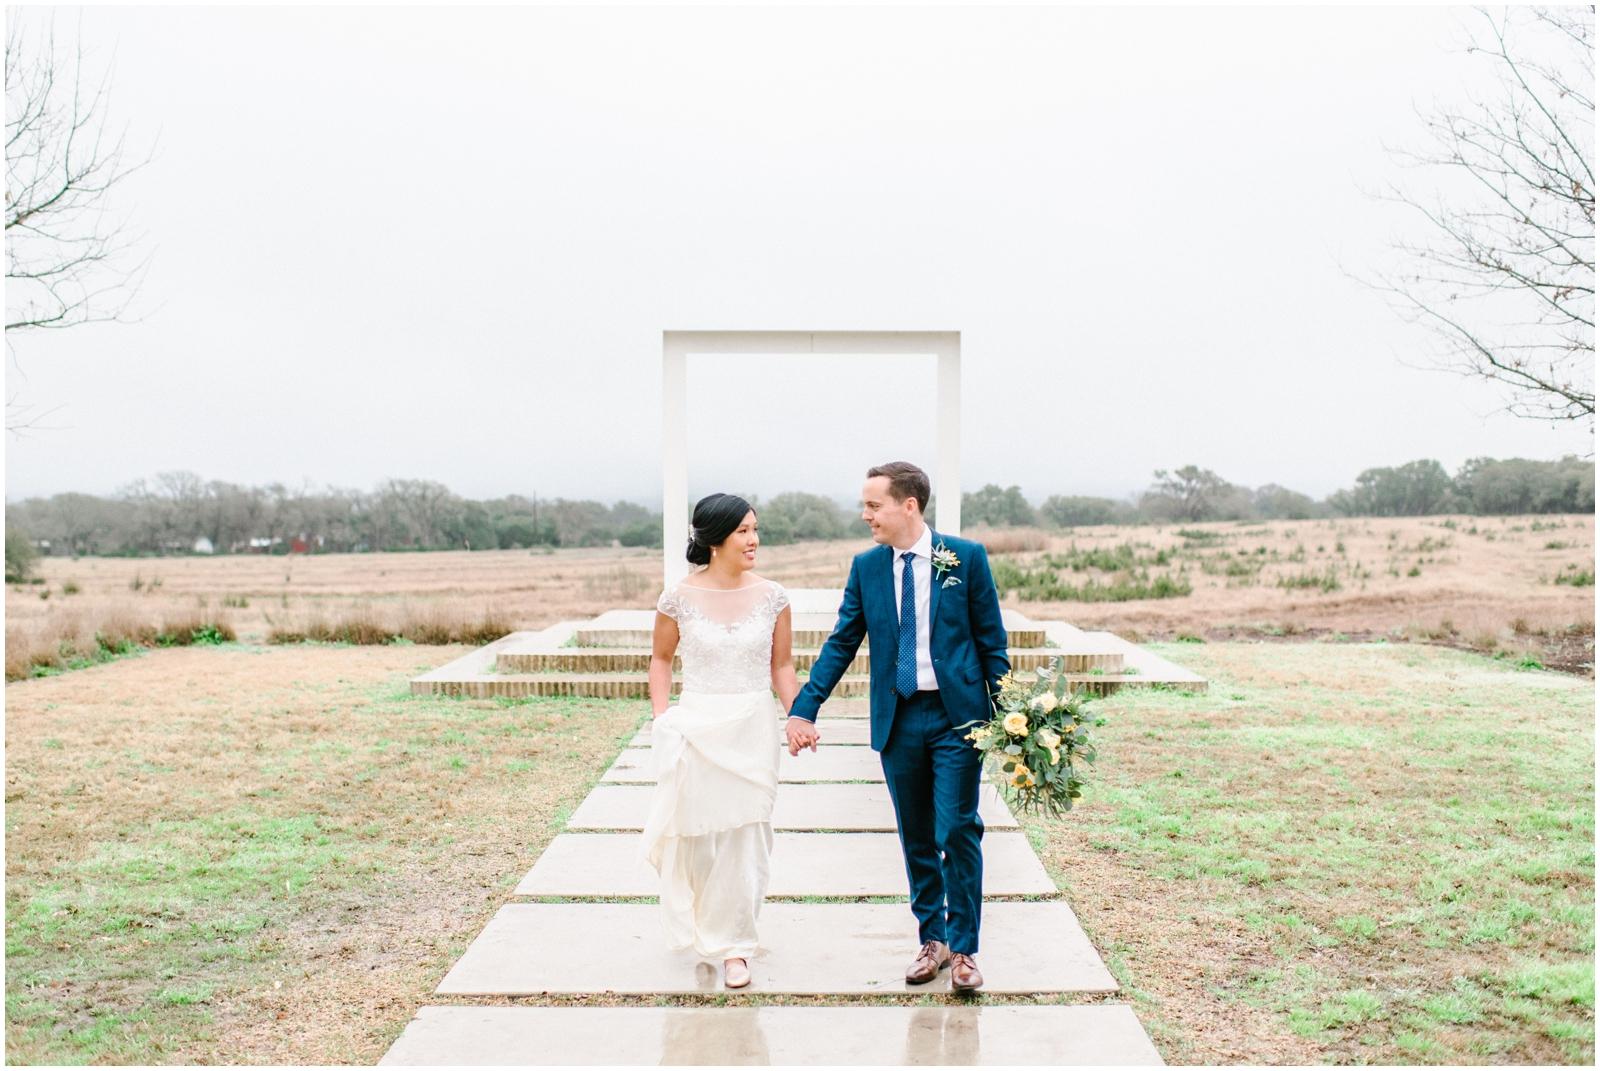 Minimalistic TX Venue Prosper House -Austin Wedding Planner_0347.jpg